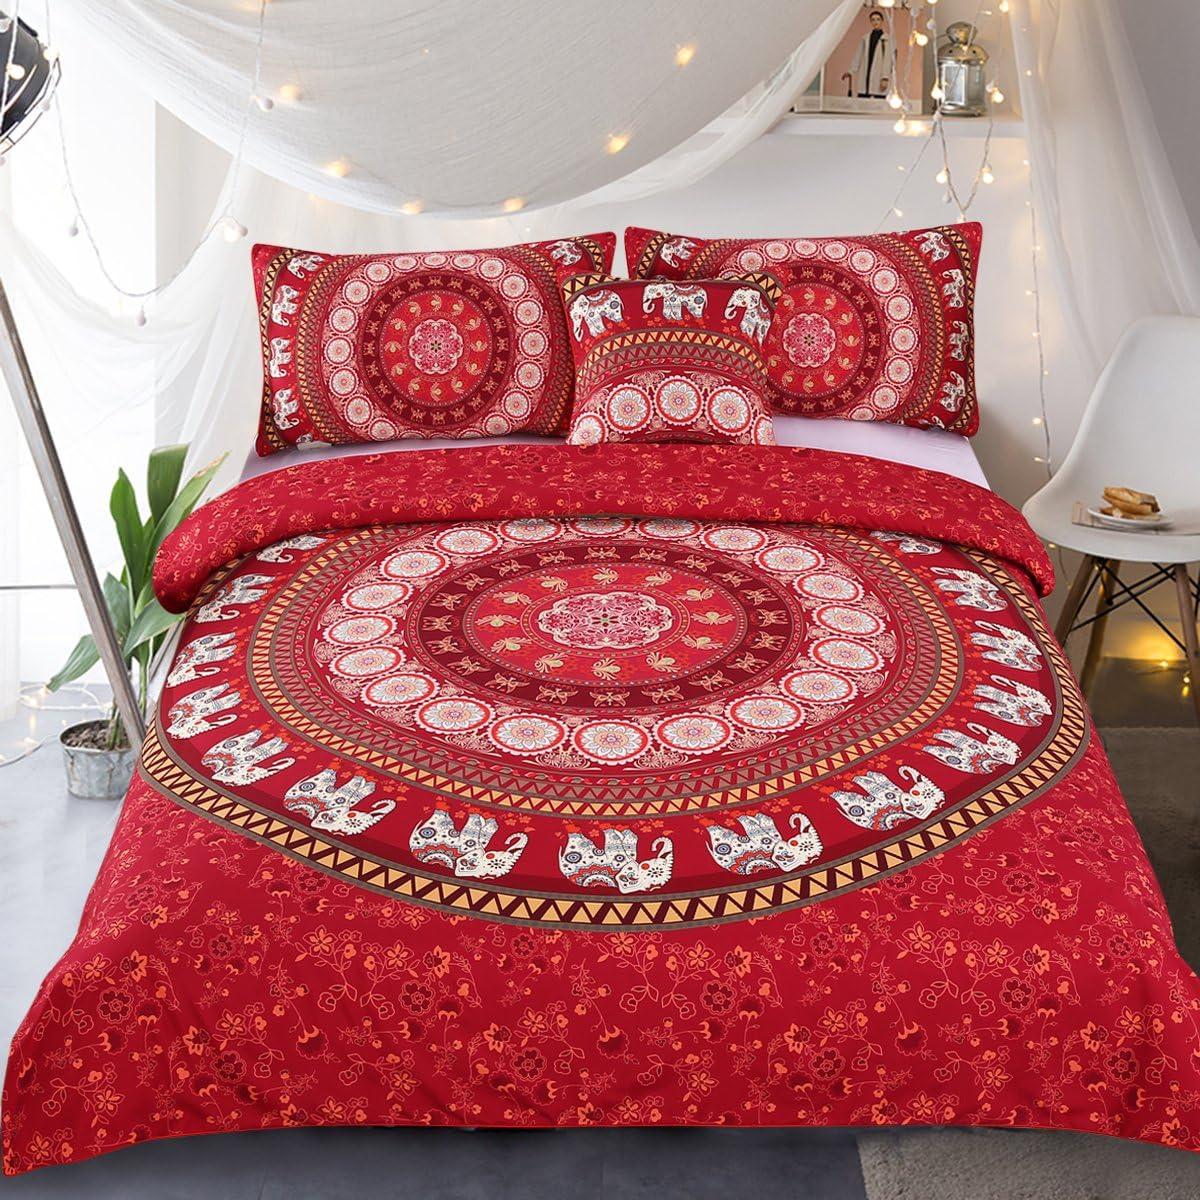 Amazon Com Sleepwish Elephant Mandala Duvet Cover Red Bohemian Bedding Hippie Bed Set Elephant Tapestry Bedding Twin Home Kitchen